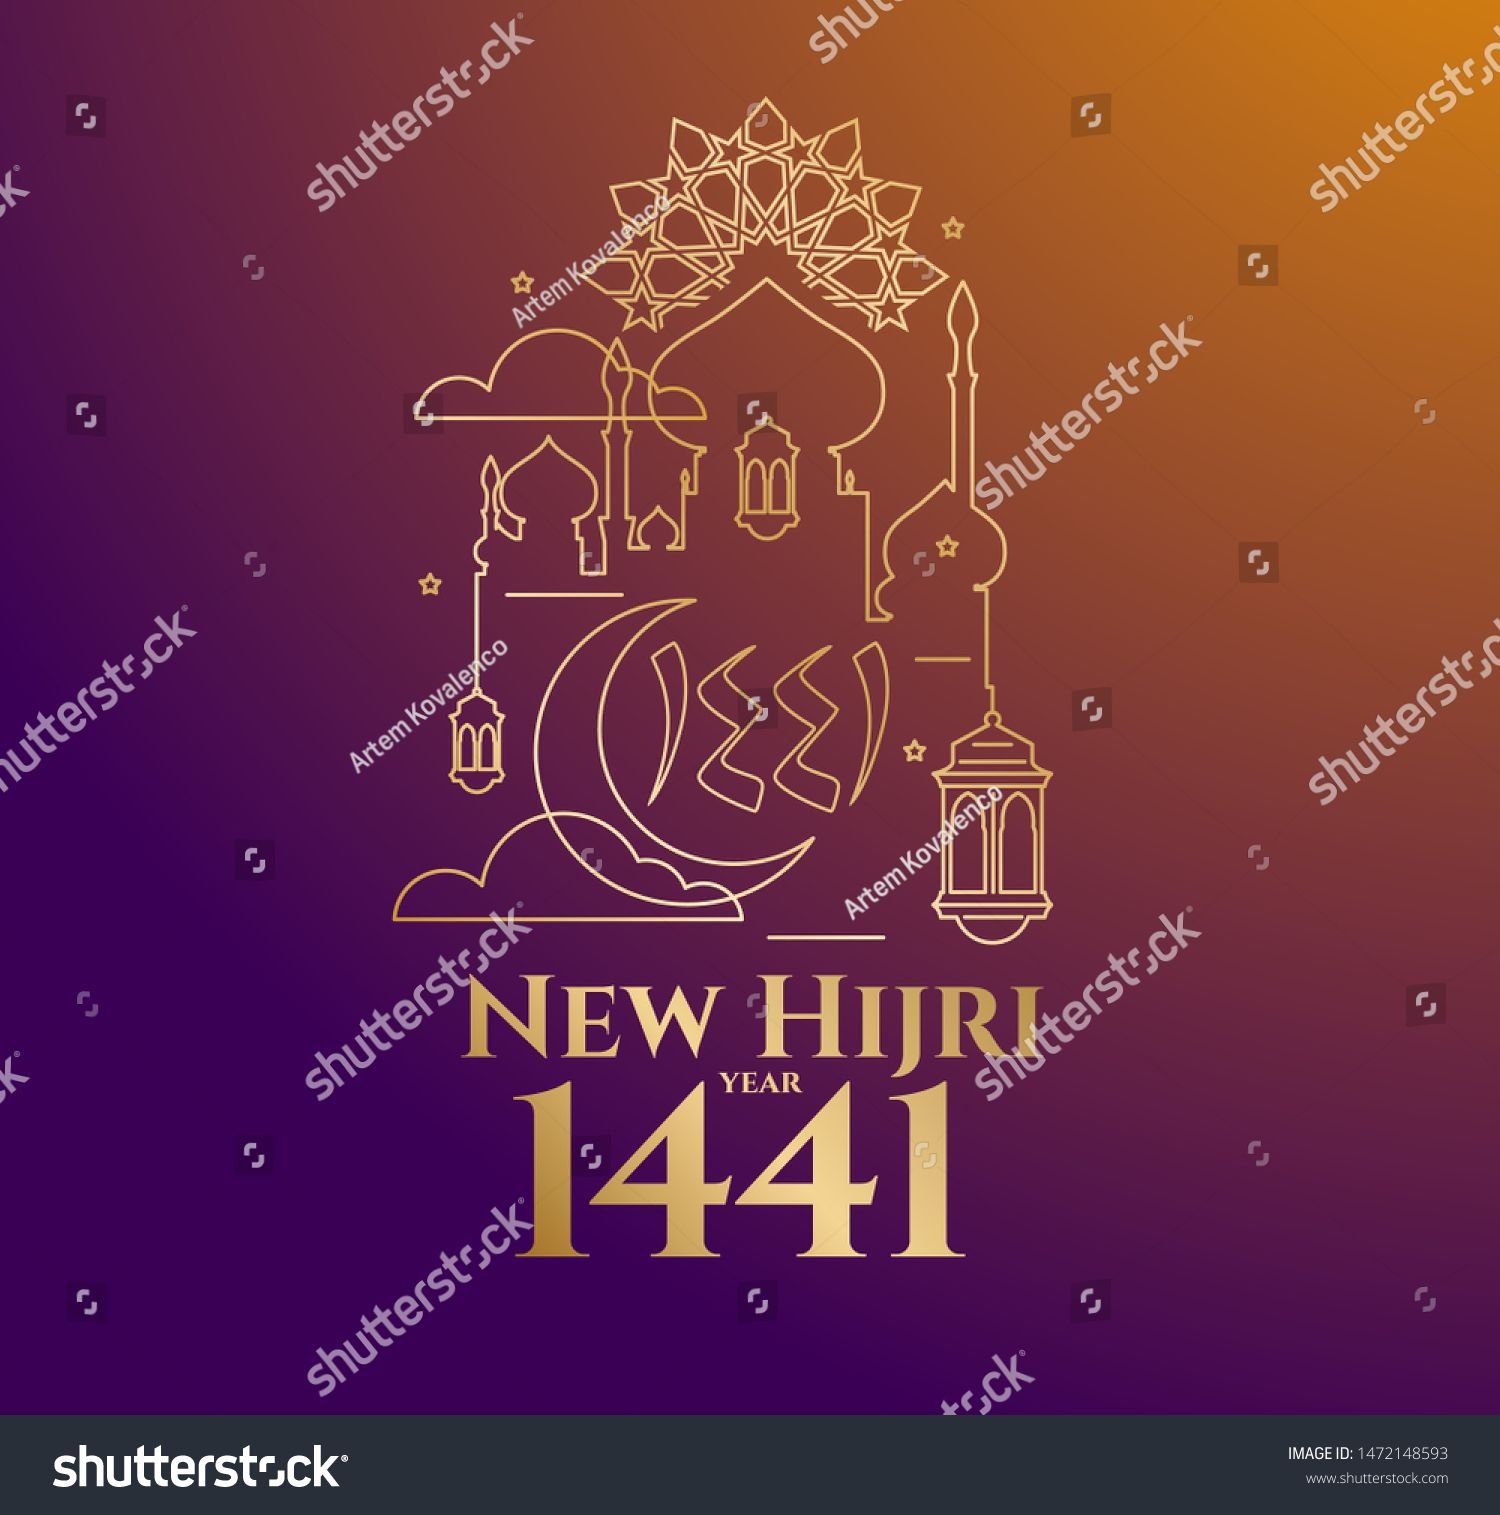 Vector Illustration Happy New Hijri Year 1441 Happy Islamic New Year Graphic Design F Happy Islamic New Year Social Media Design Graphics Vector Illustration